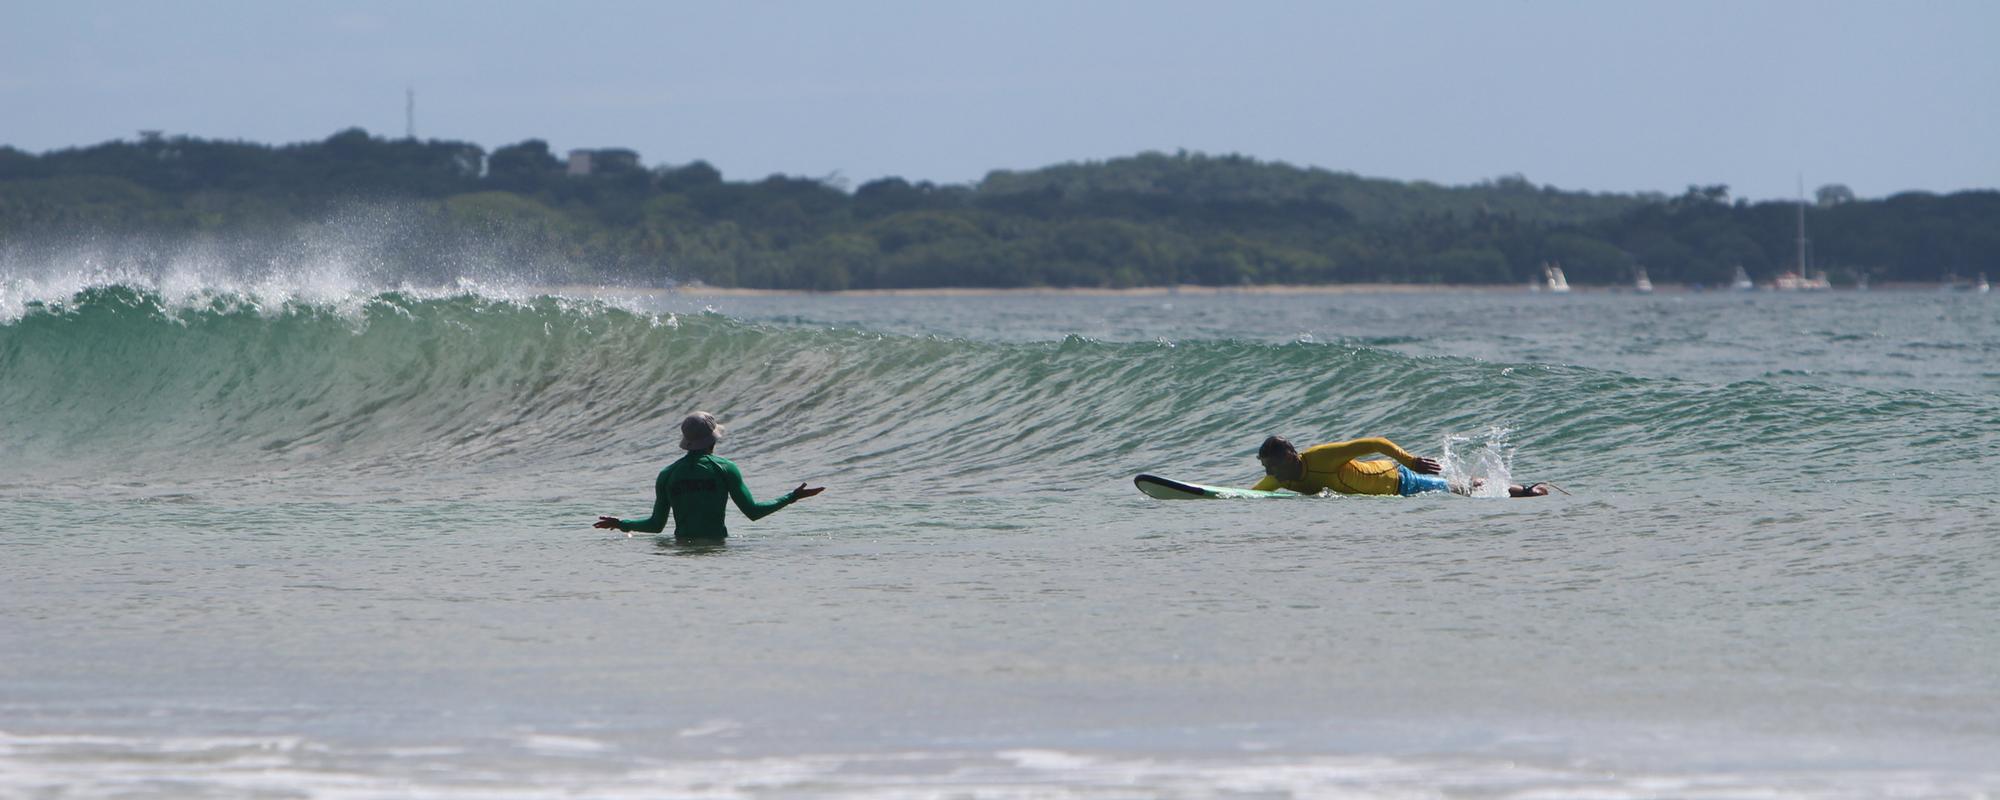 surfing near playa grande